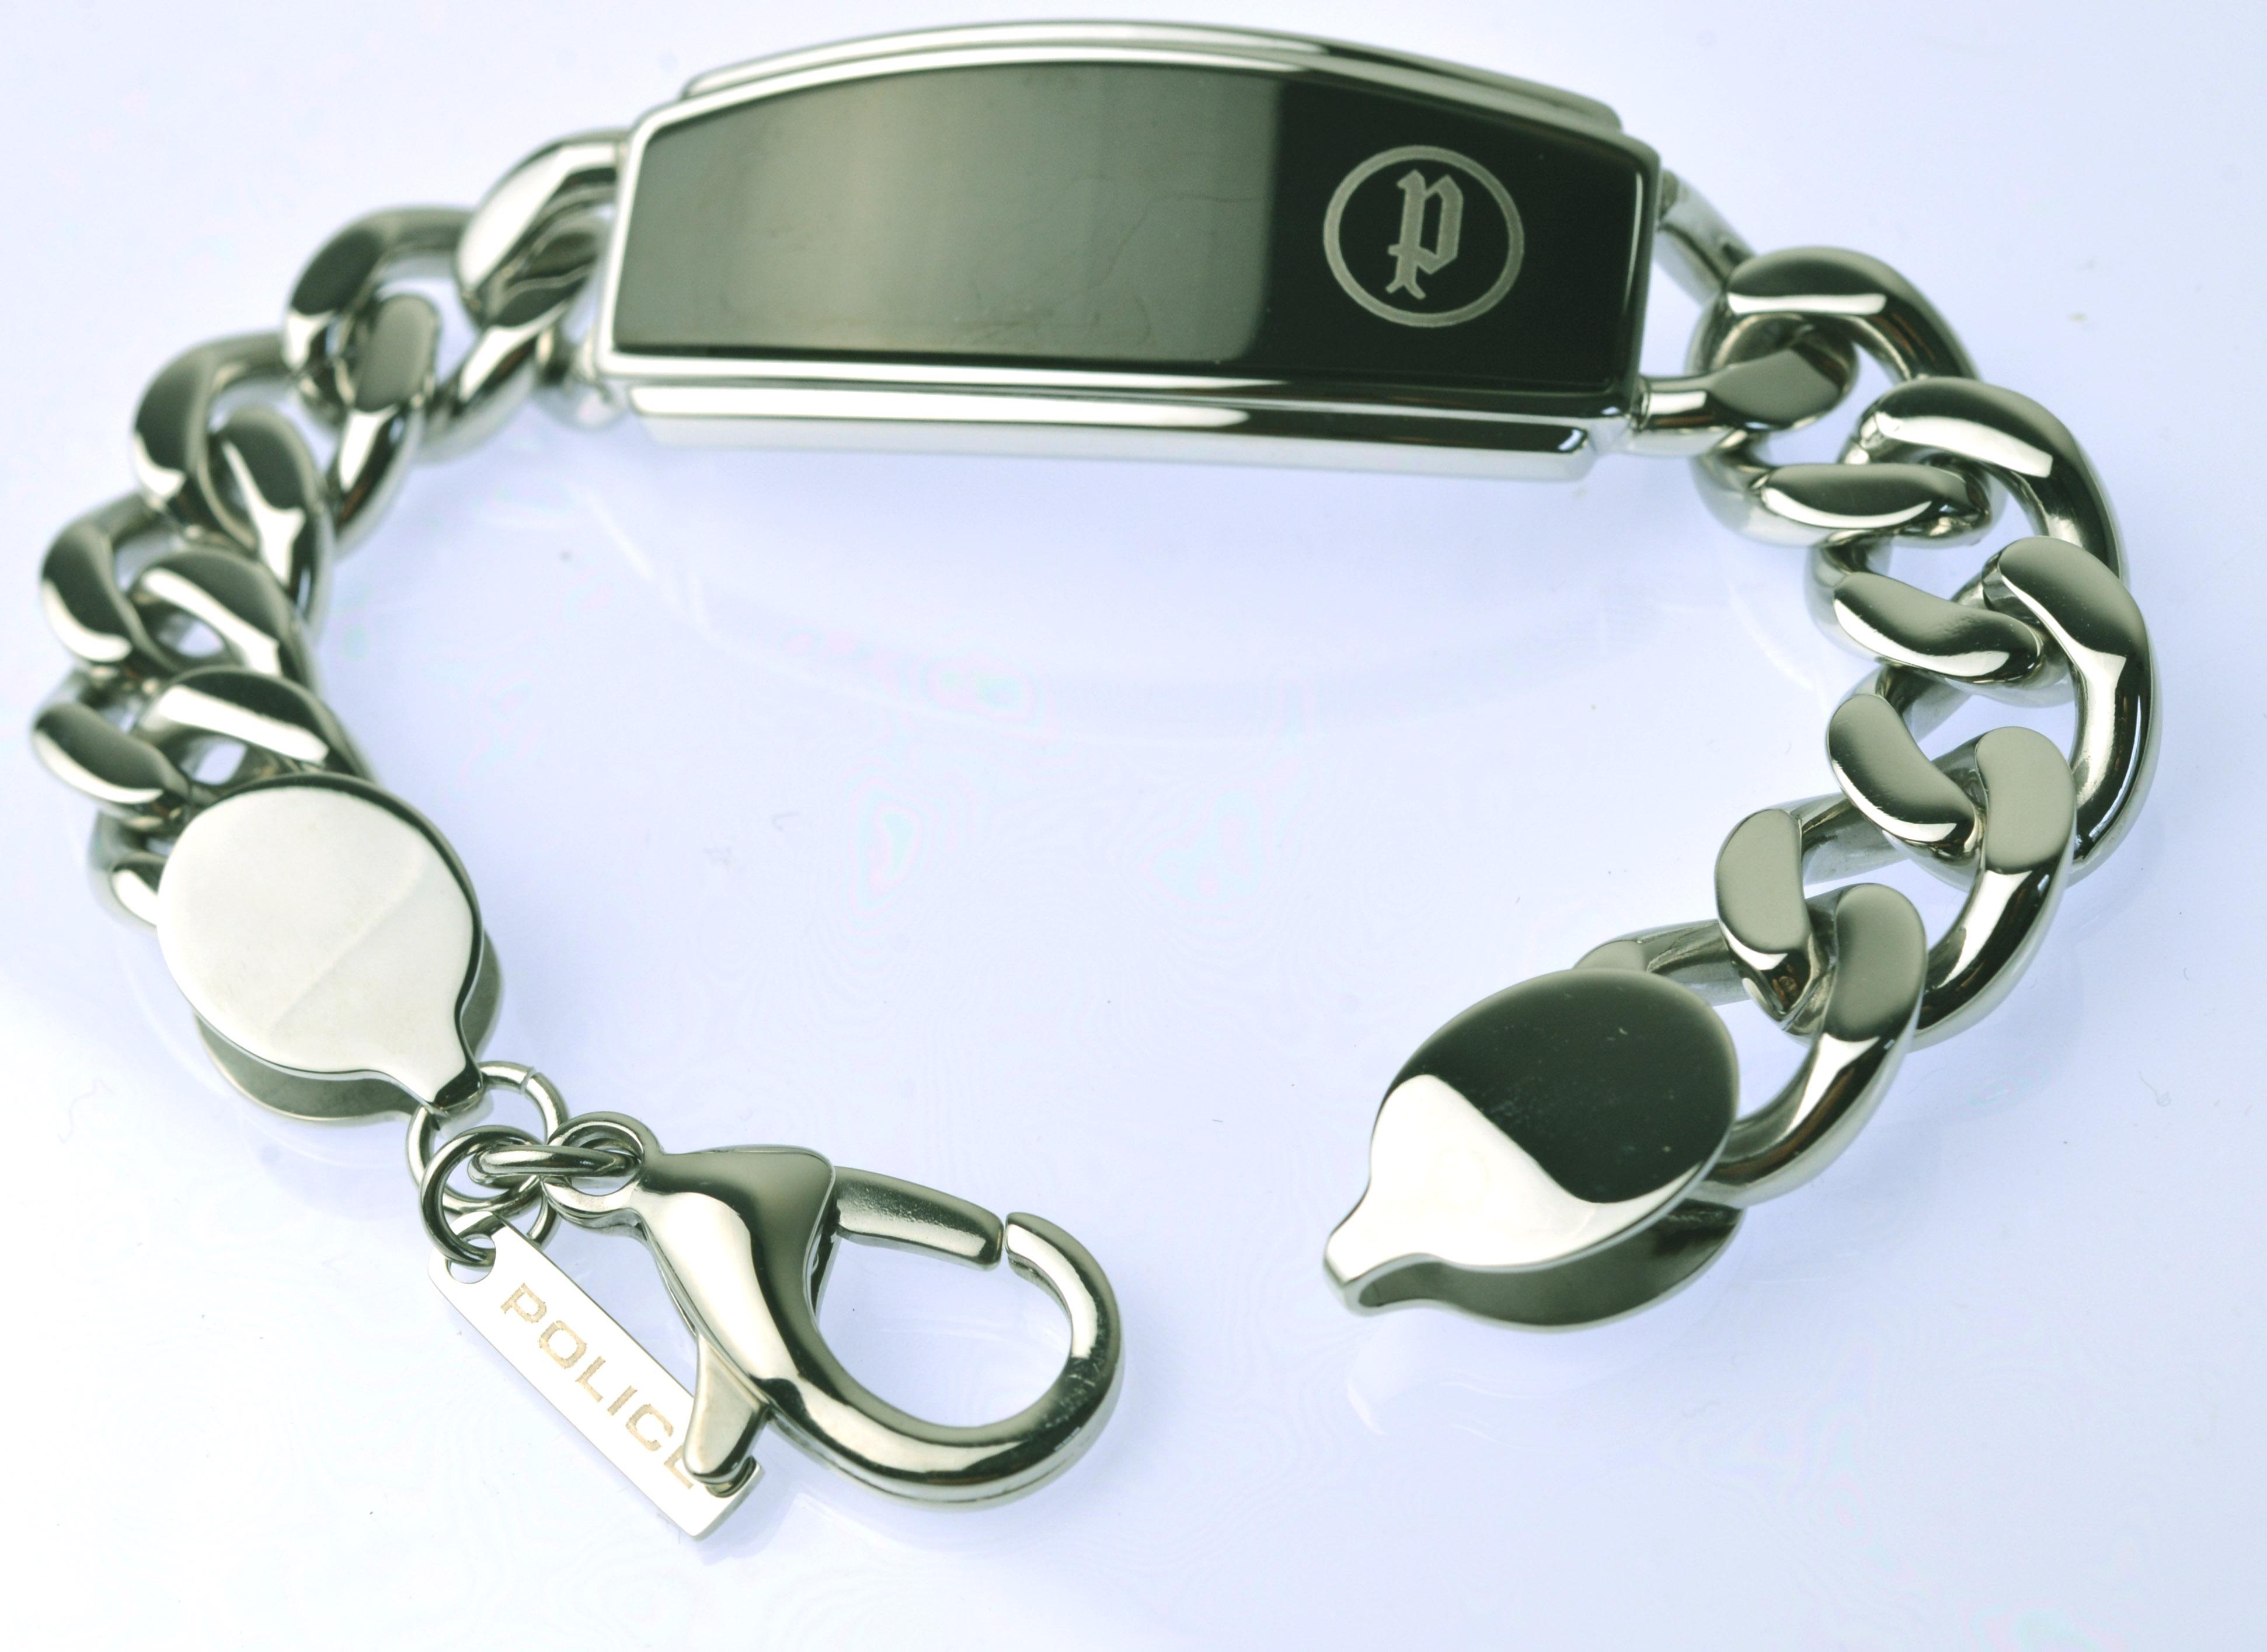 http://www.police.ne.jp/images/police__bracelet_29.jpg